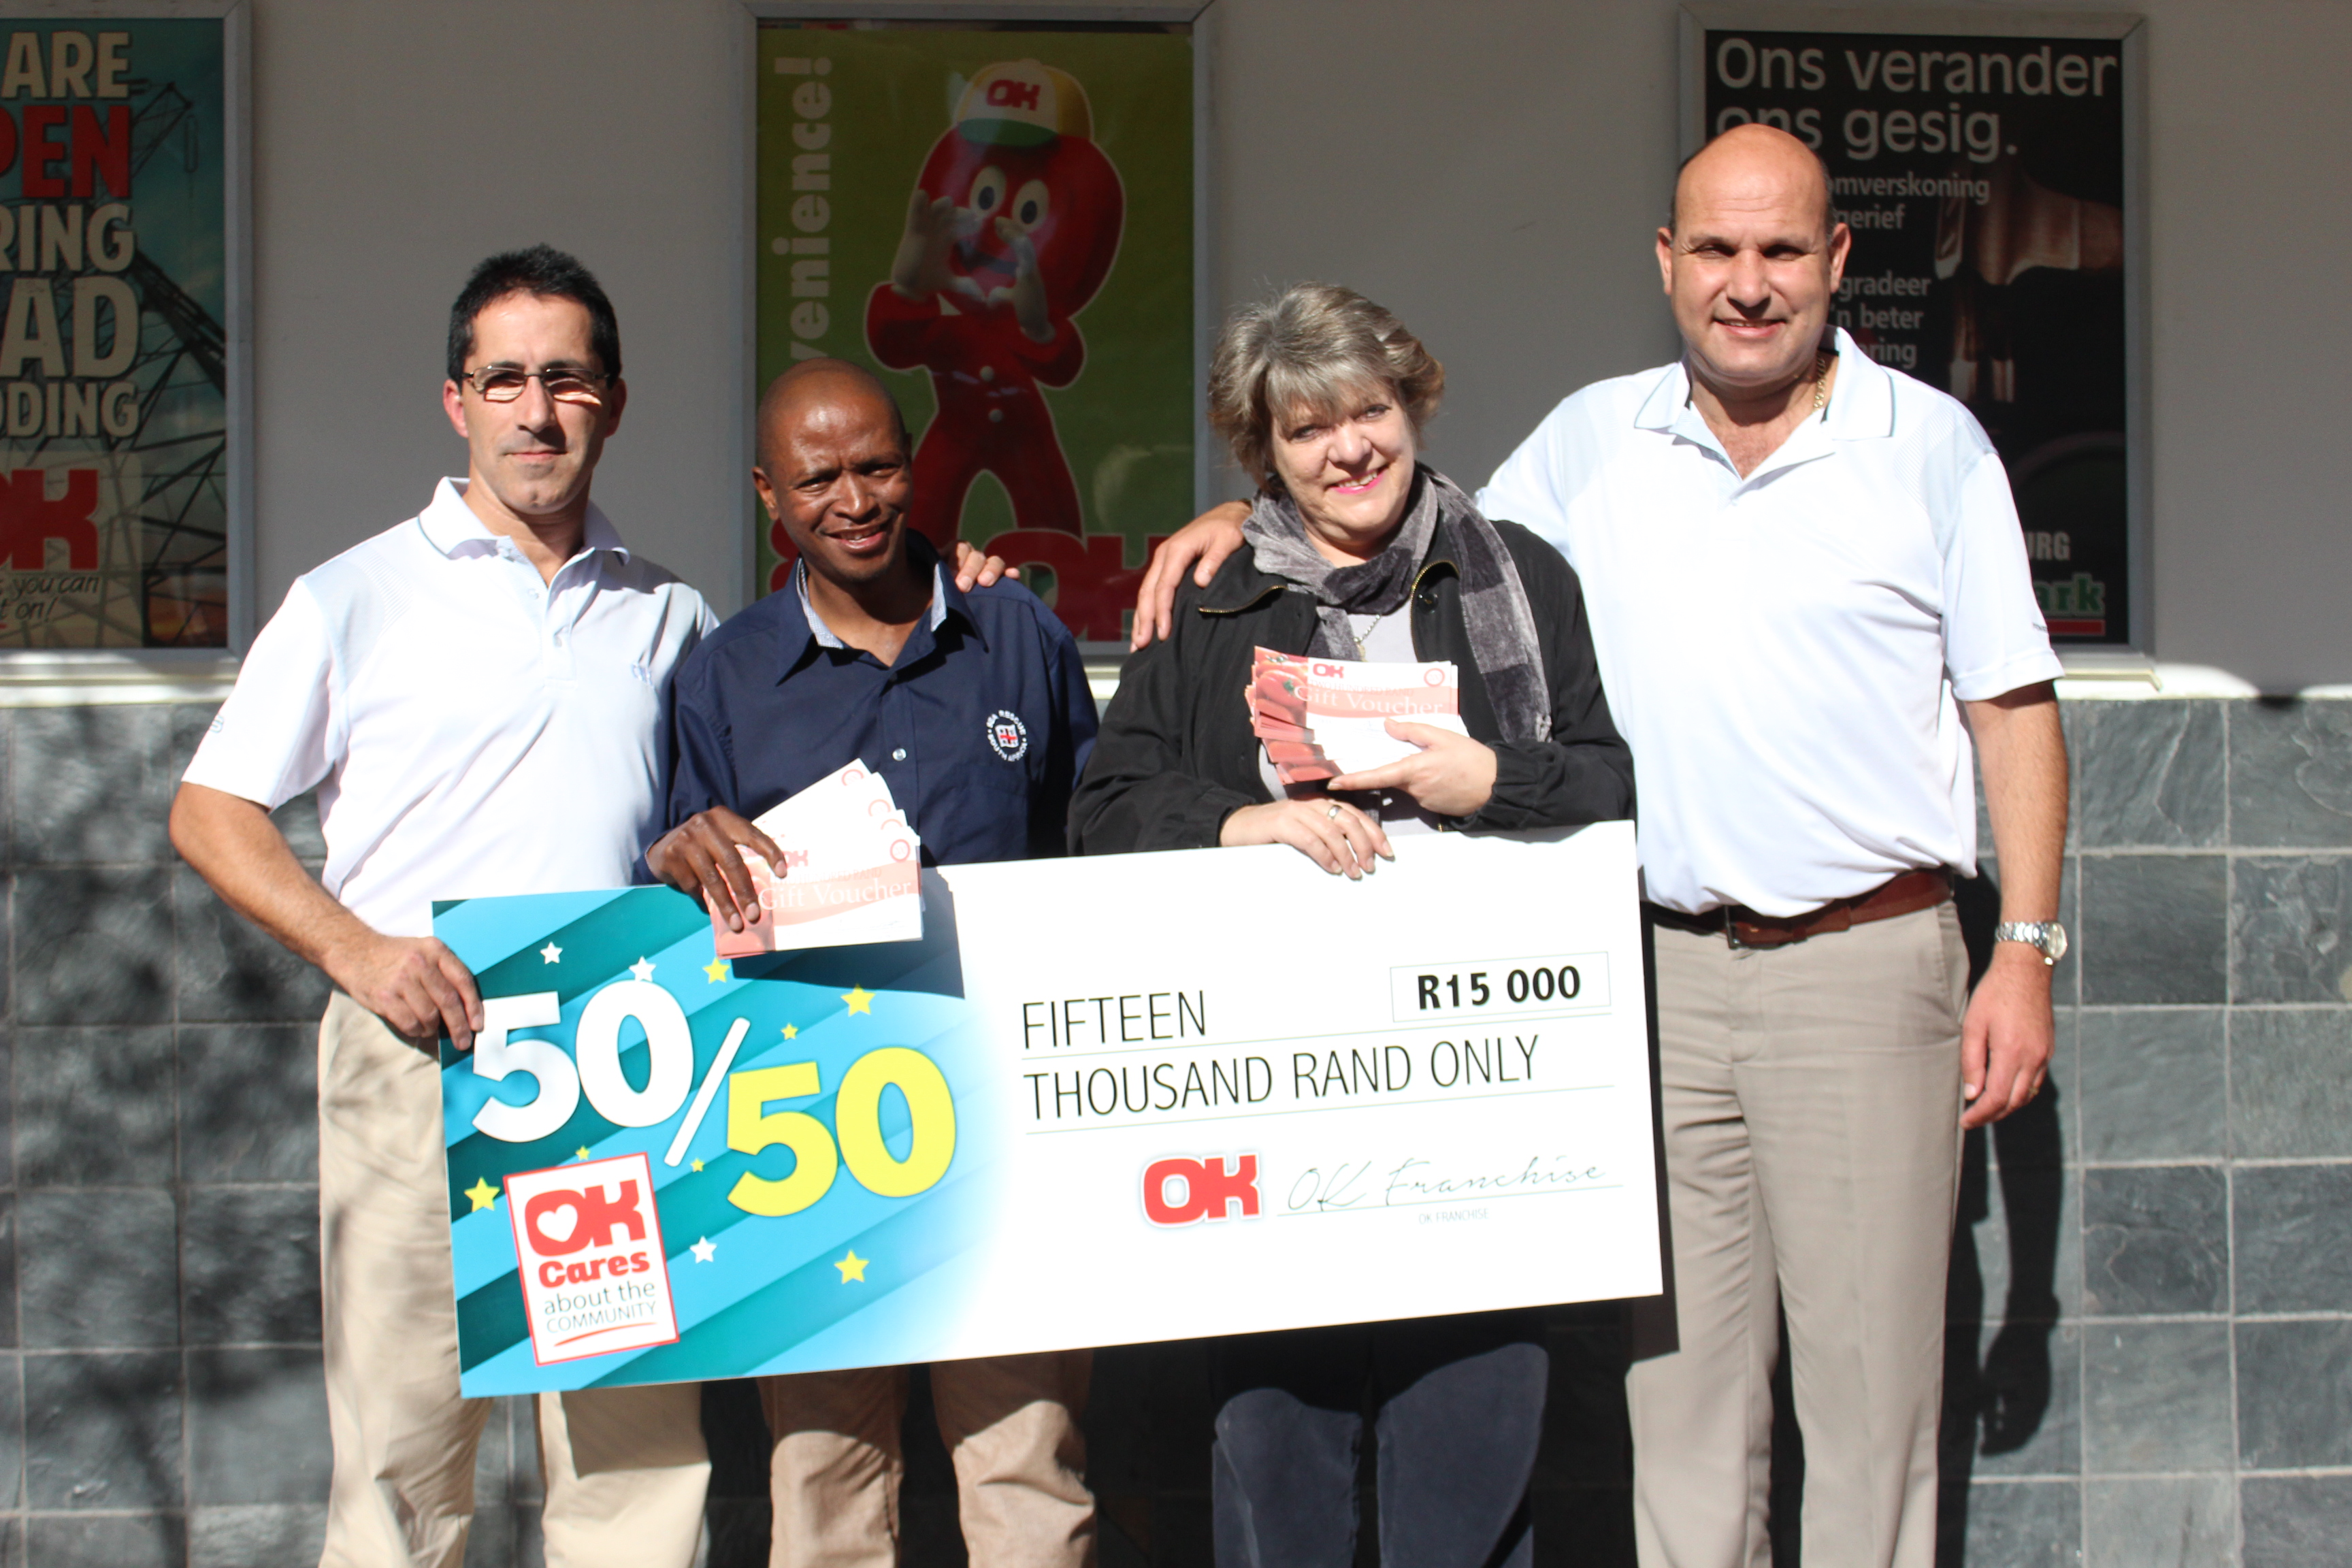 Jose Dos Santos of OK; Richard Tsholoba (NSRI), Lizette Geldenhuys ( our winner) and Jack Voges (OK) at at OK MiniMark in Denneburg Paarl. Picture Maryke Swart / Paarlpost.